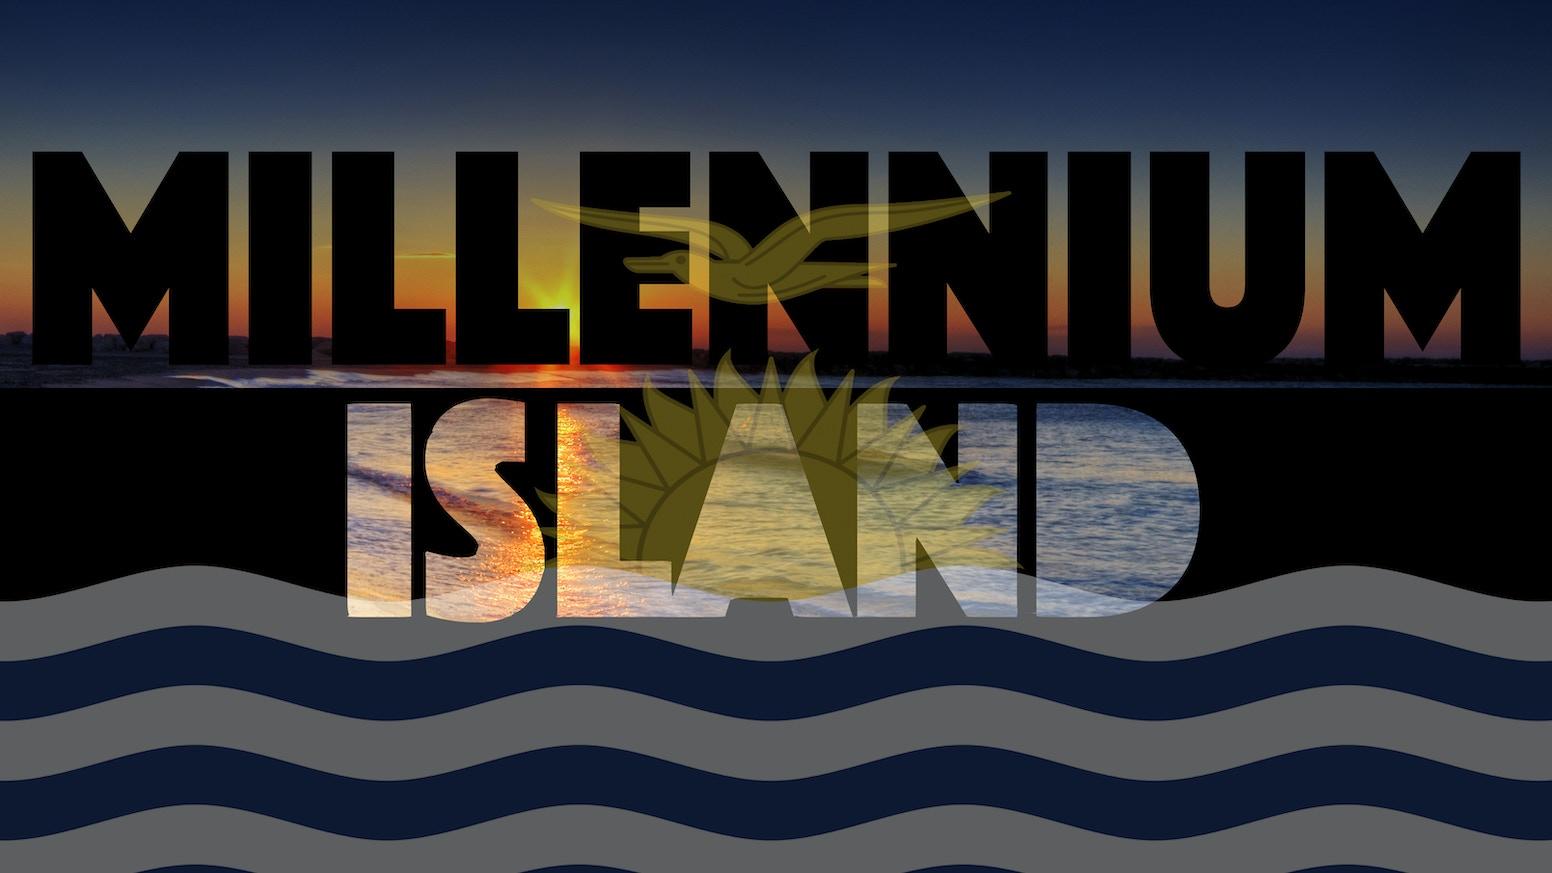 Millennium Island by Lulu DeBoer — Kickstarter